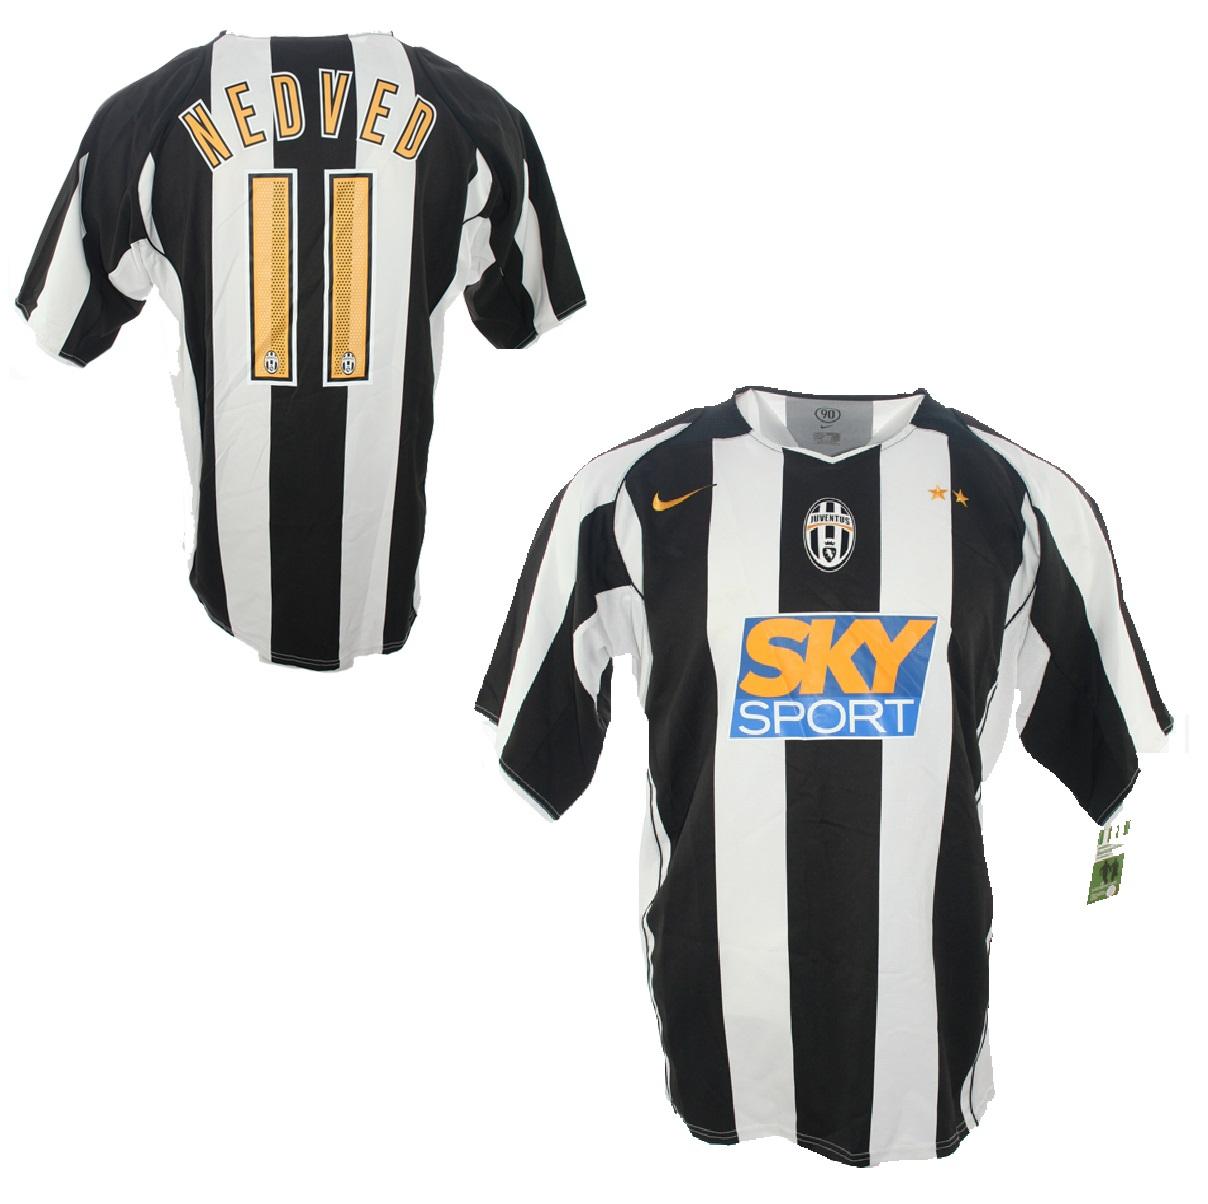 70292536e Nike Juventus Turin jersey 11 Pavel Nedved Sky sports 2004-06 home men s XL